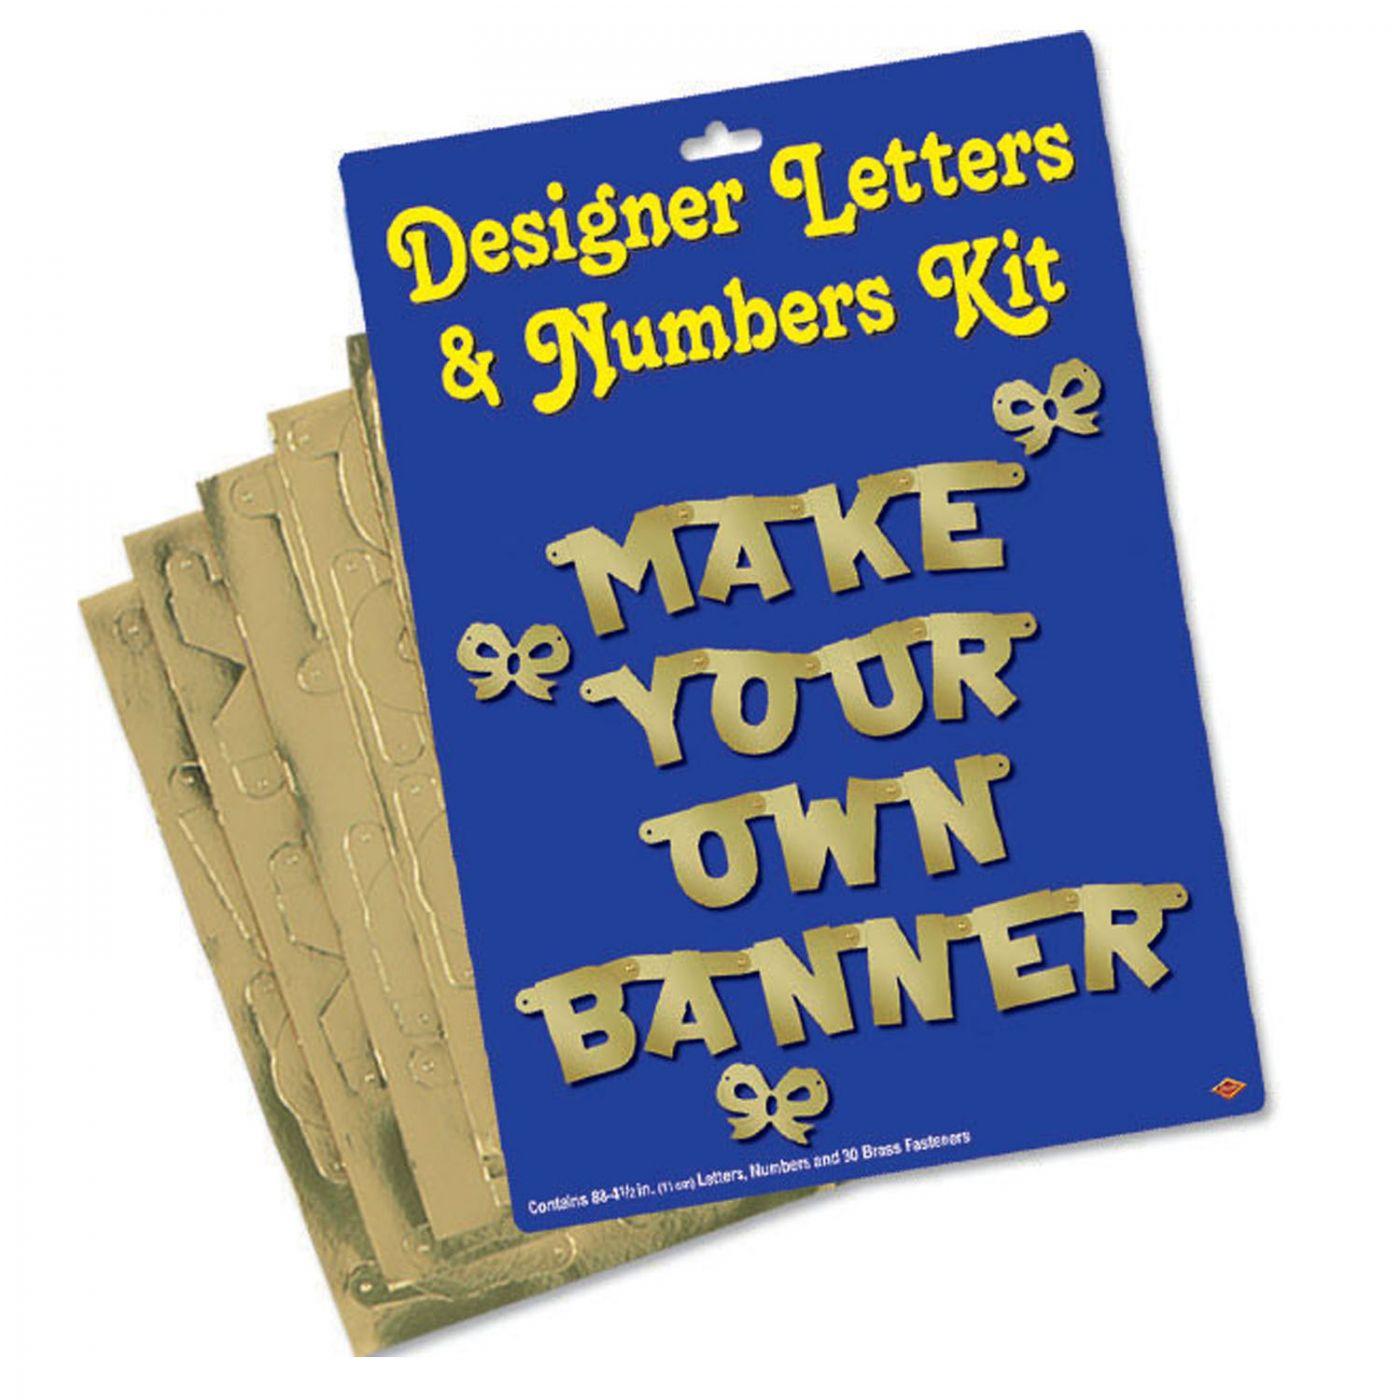 Designer Letters & Numbers Kit (6) image